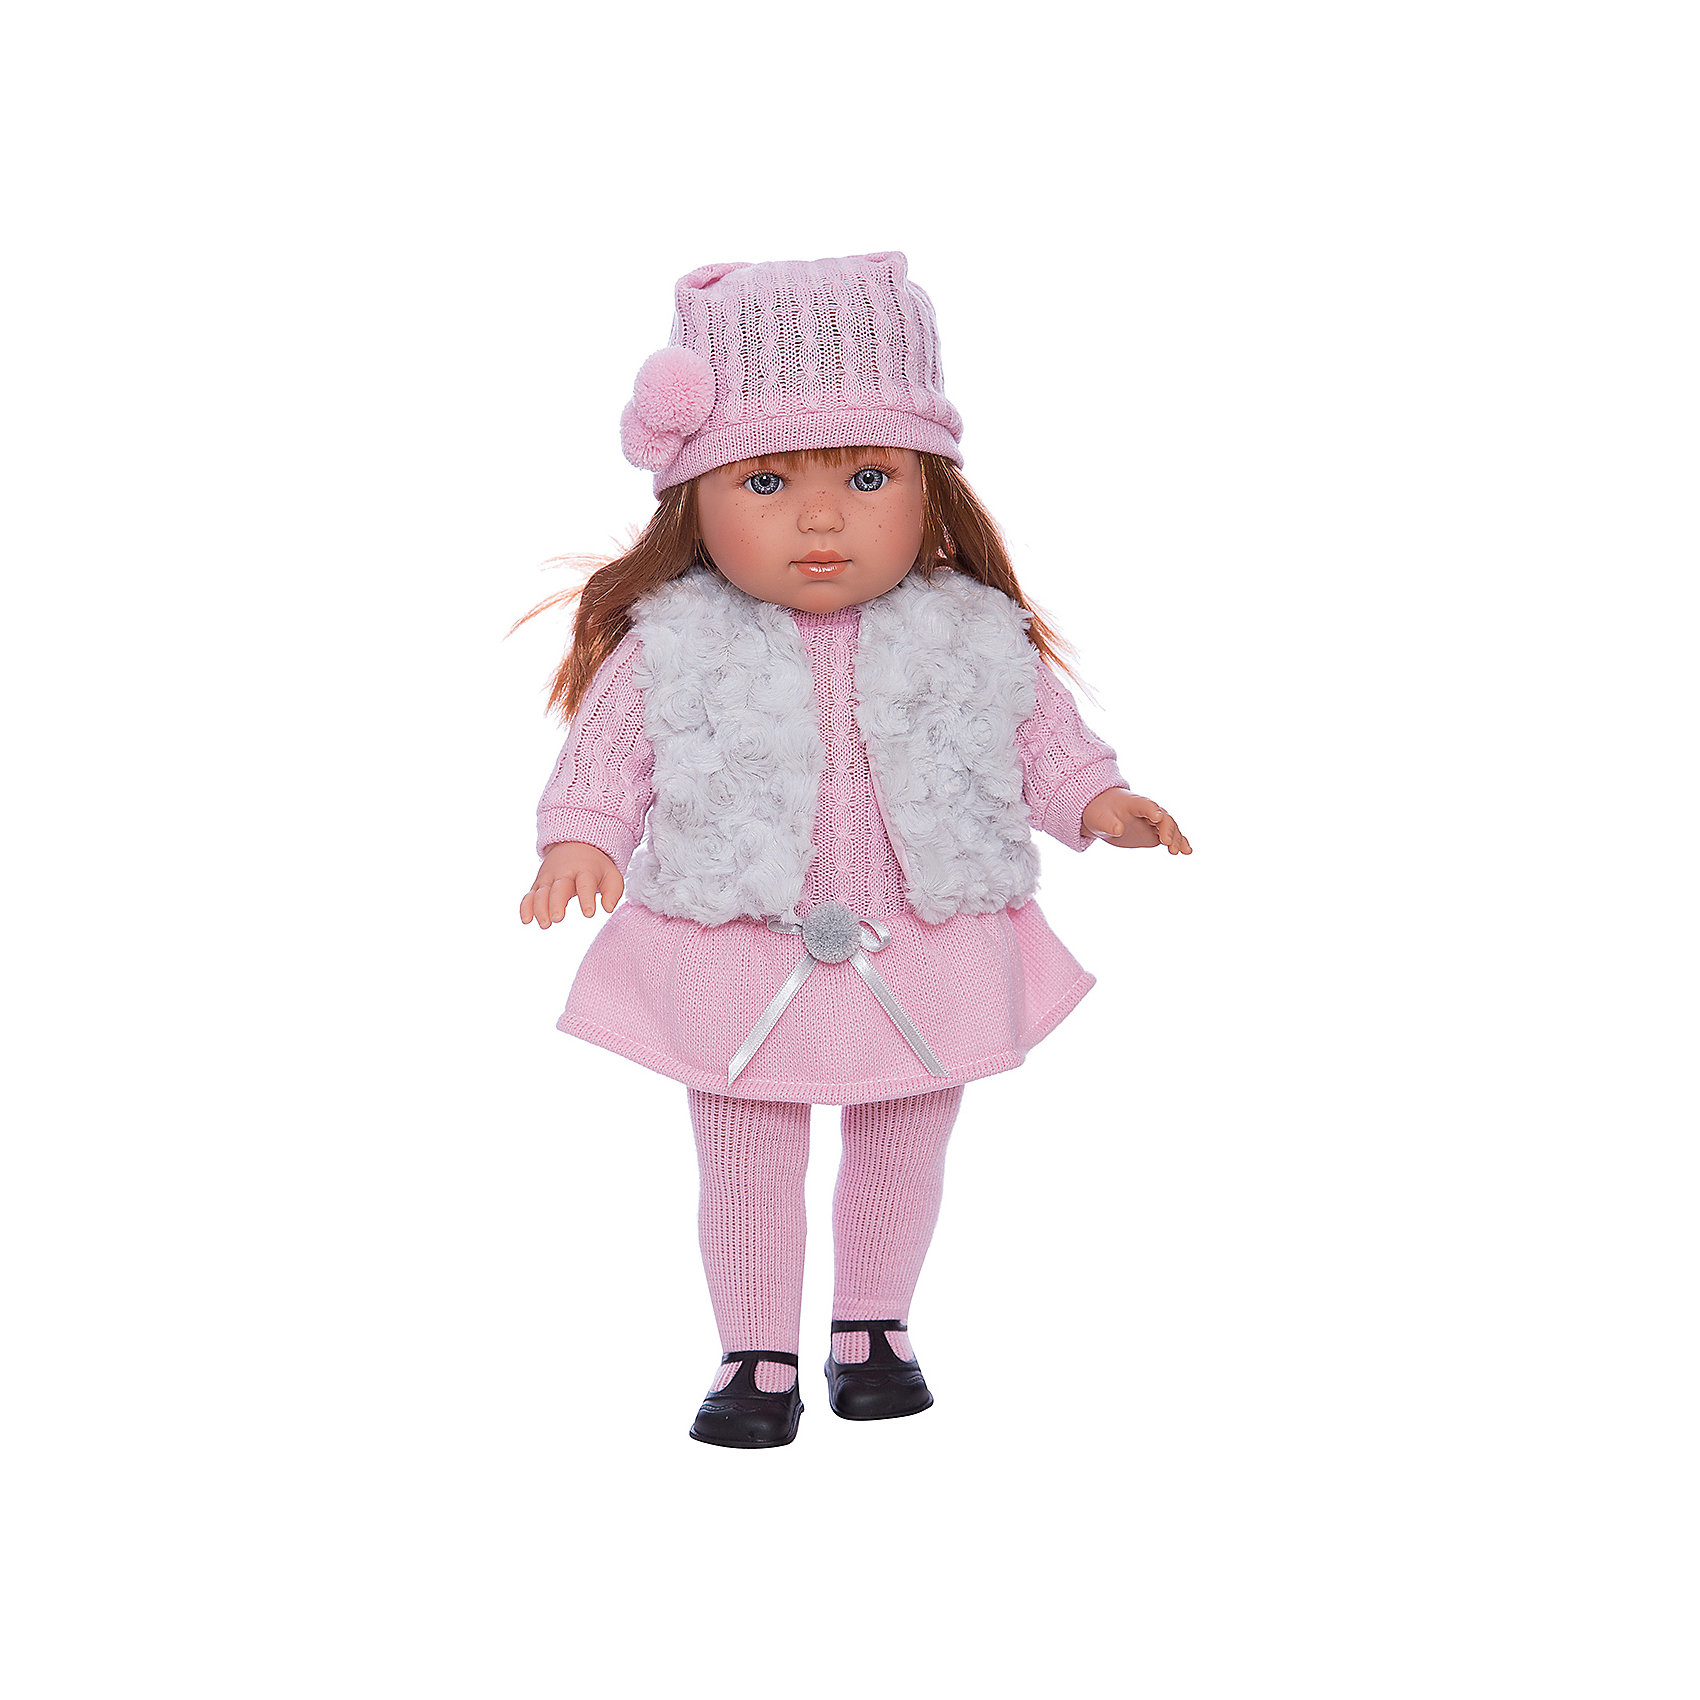 Llorens Кукла Лаура, 45 см, Llorens llorens кукла лаура 45 см l 54514